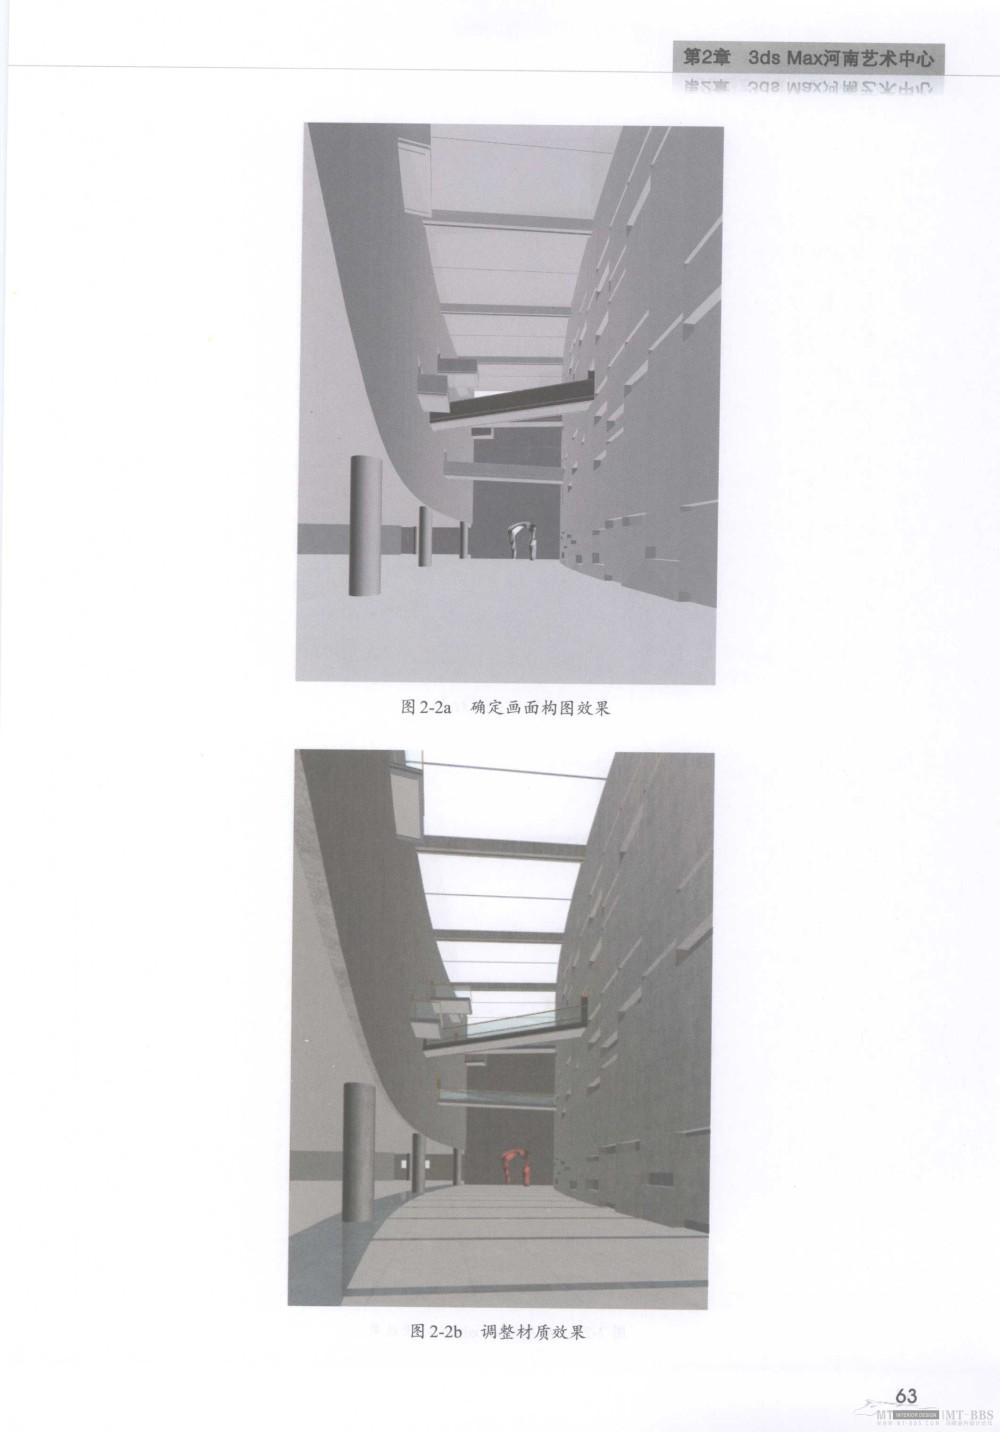 水晶石技法-3ds_Max&VRay室内空间表现_水晶石技法-3ds_Max&VRay室内空间表现_页面_069.jpg